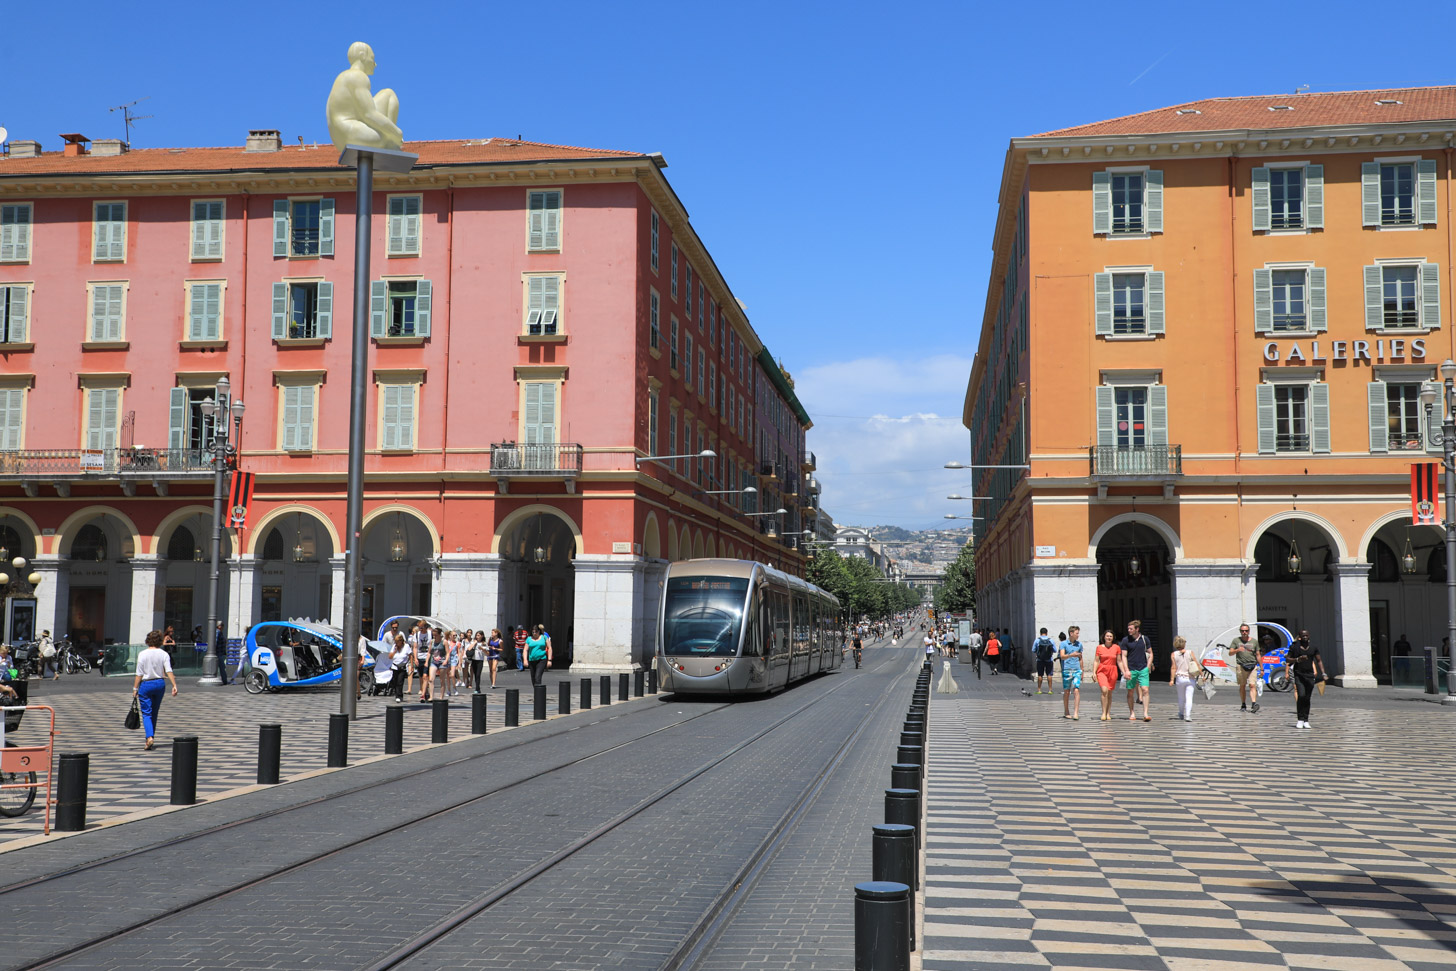 tram in Nice